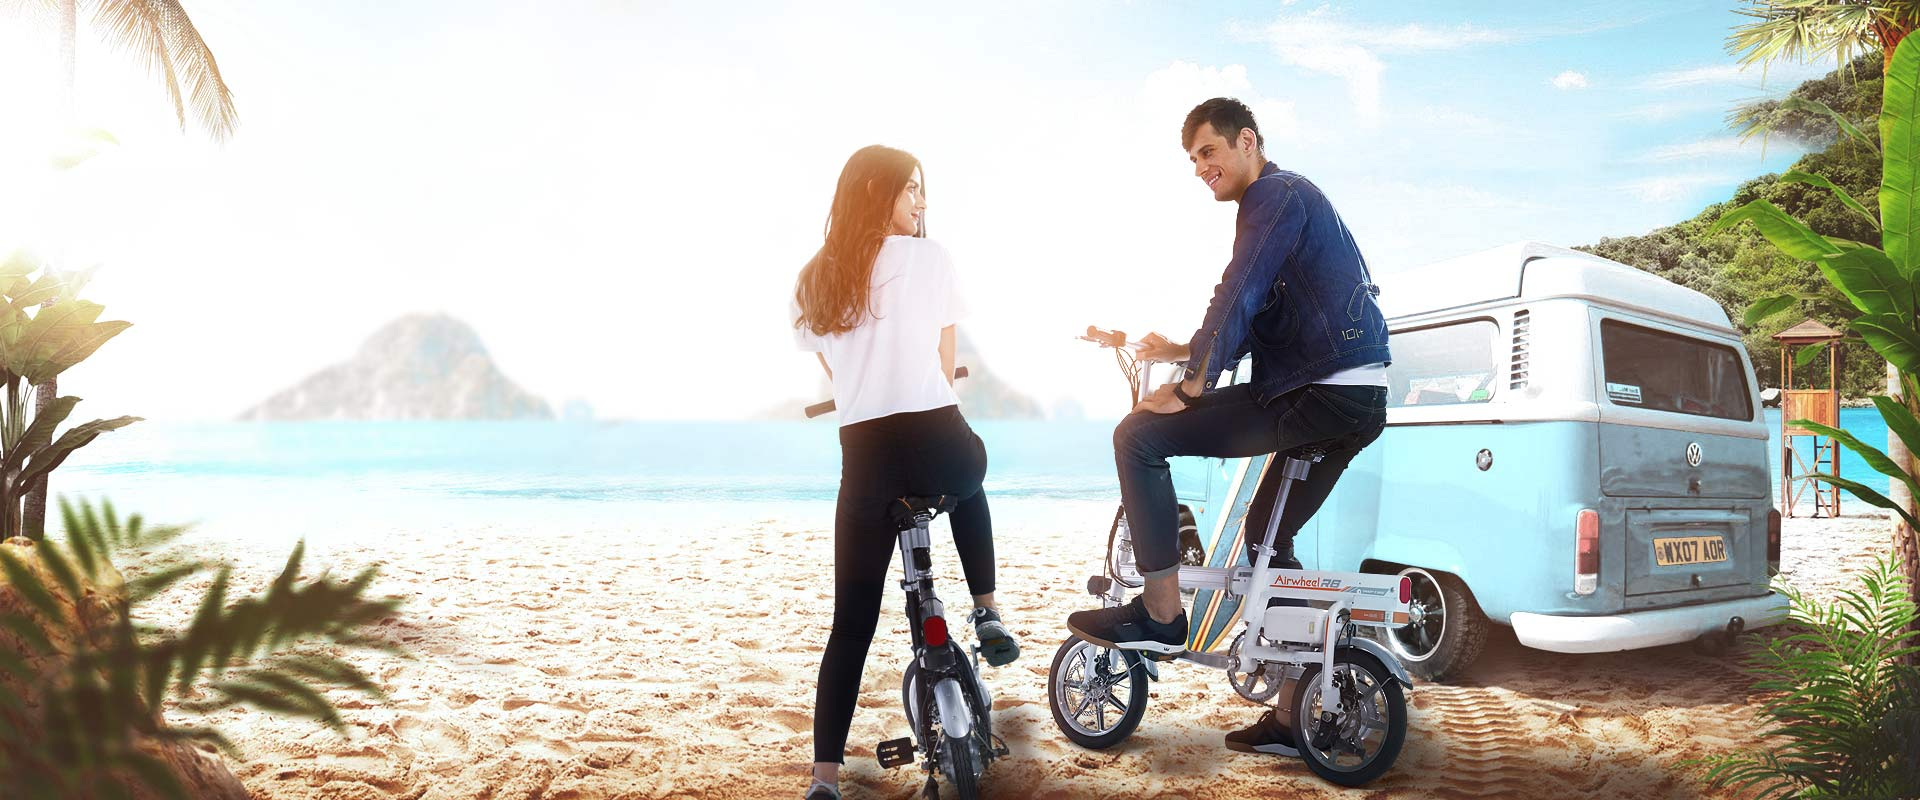 Airwheel R6 الدراجة الكهربائية